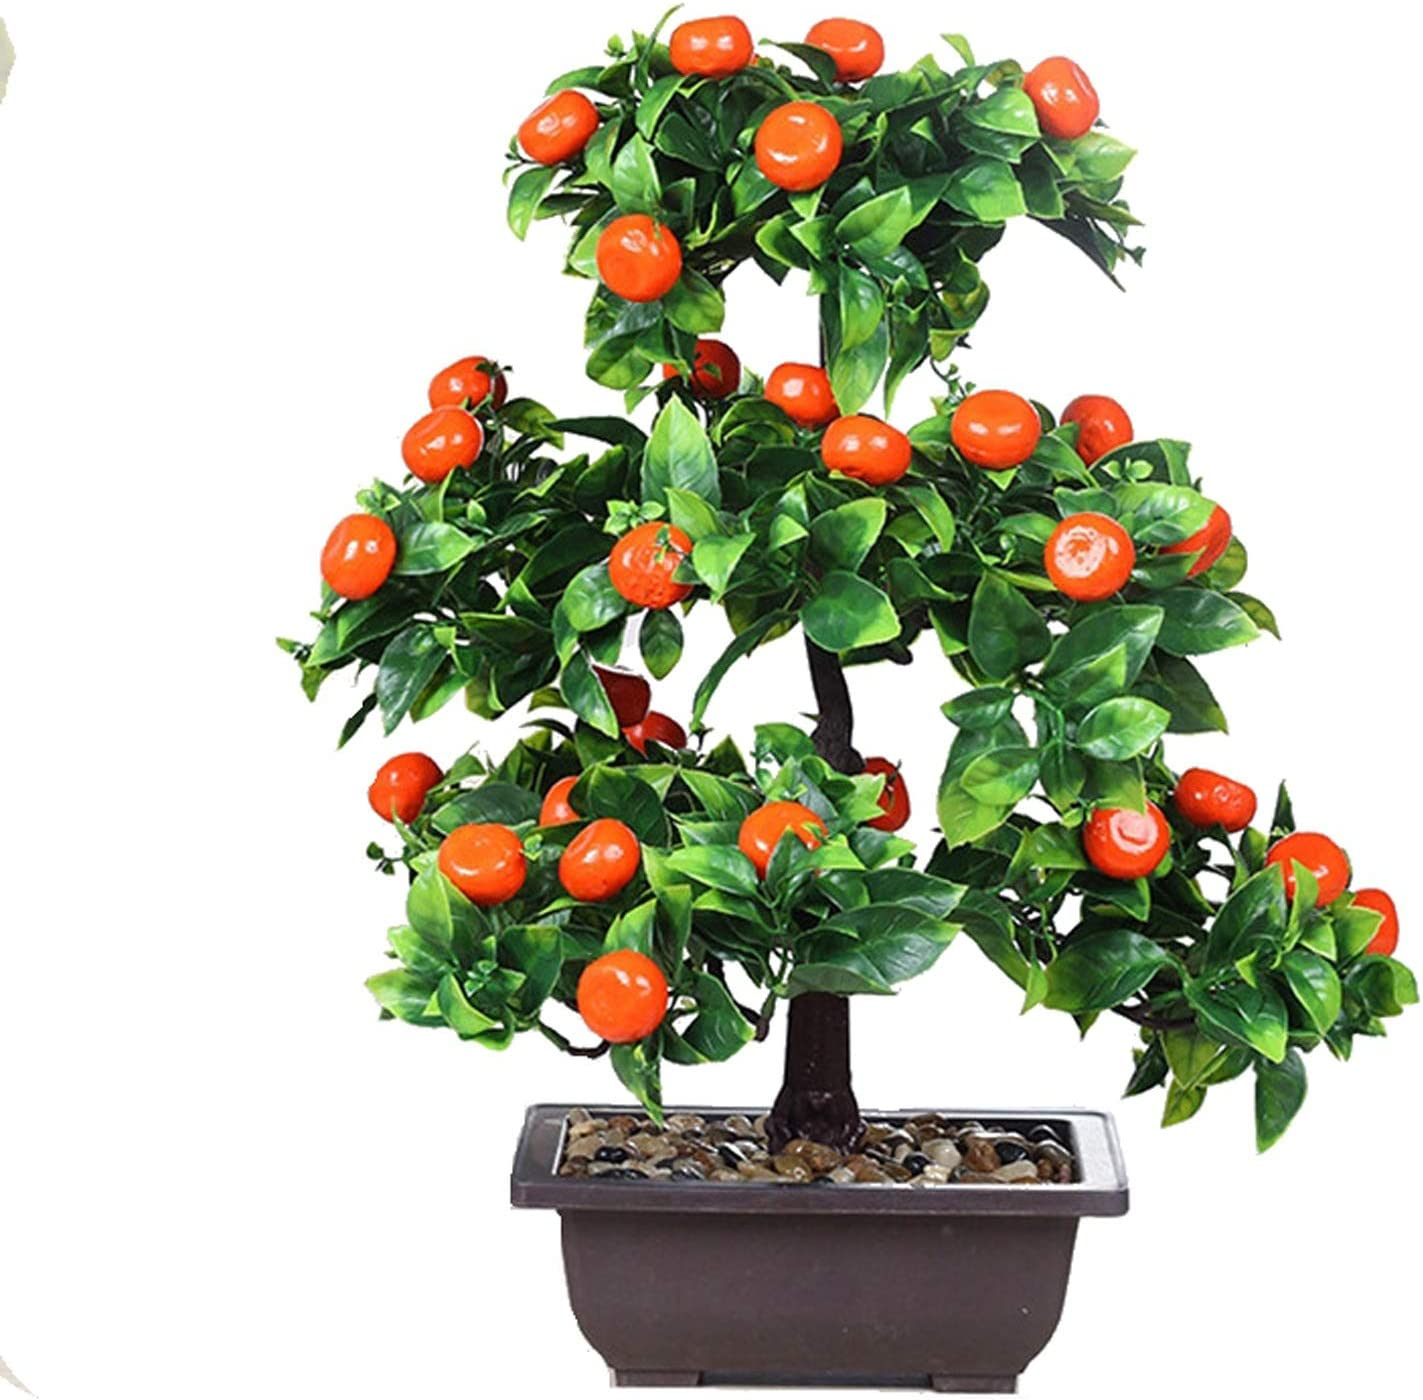 HONGFEISHANGMAO Artificial Max 60% OFF Bonsai Max 50% OFF Tree Pl Fake